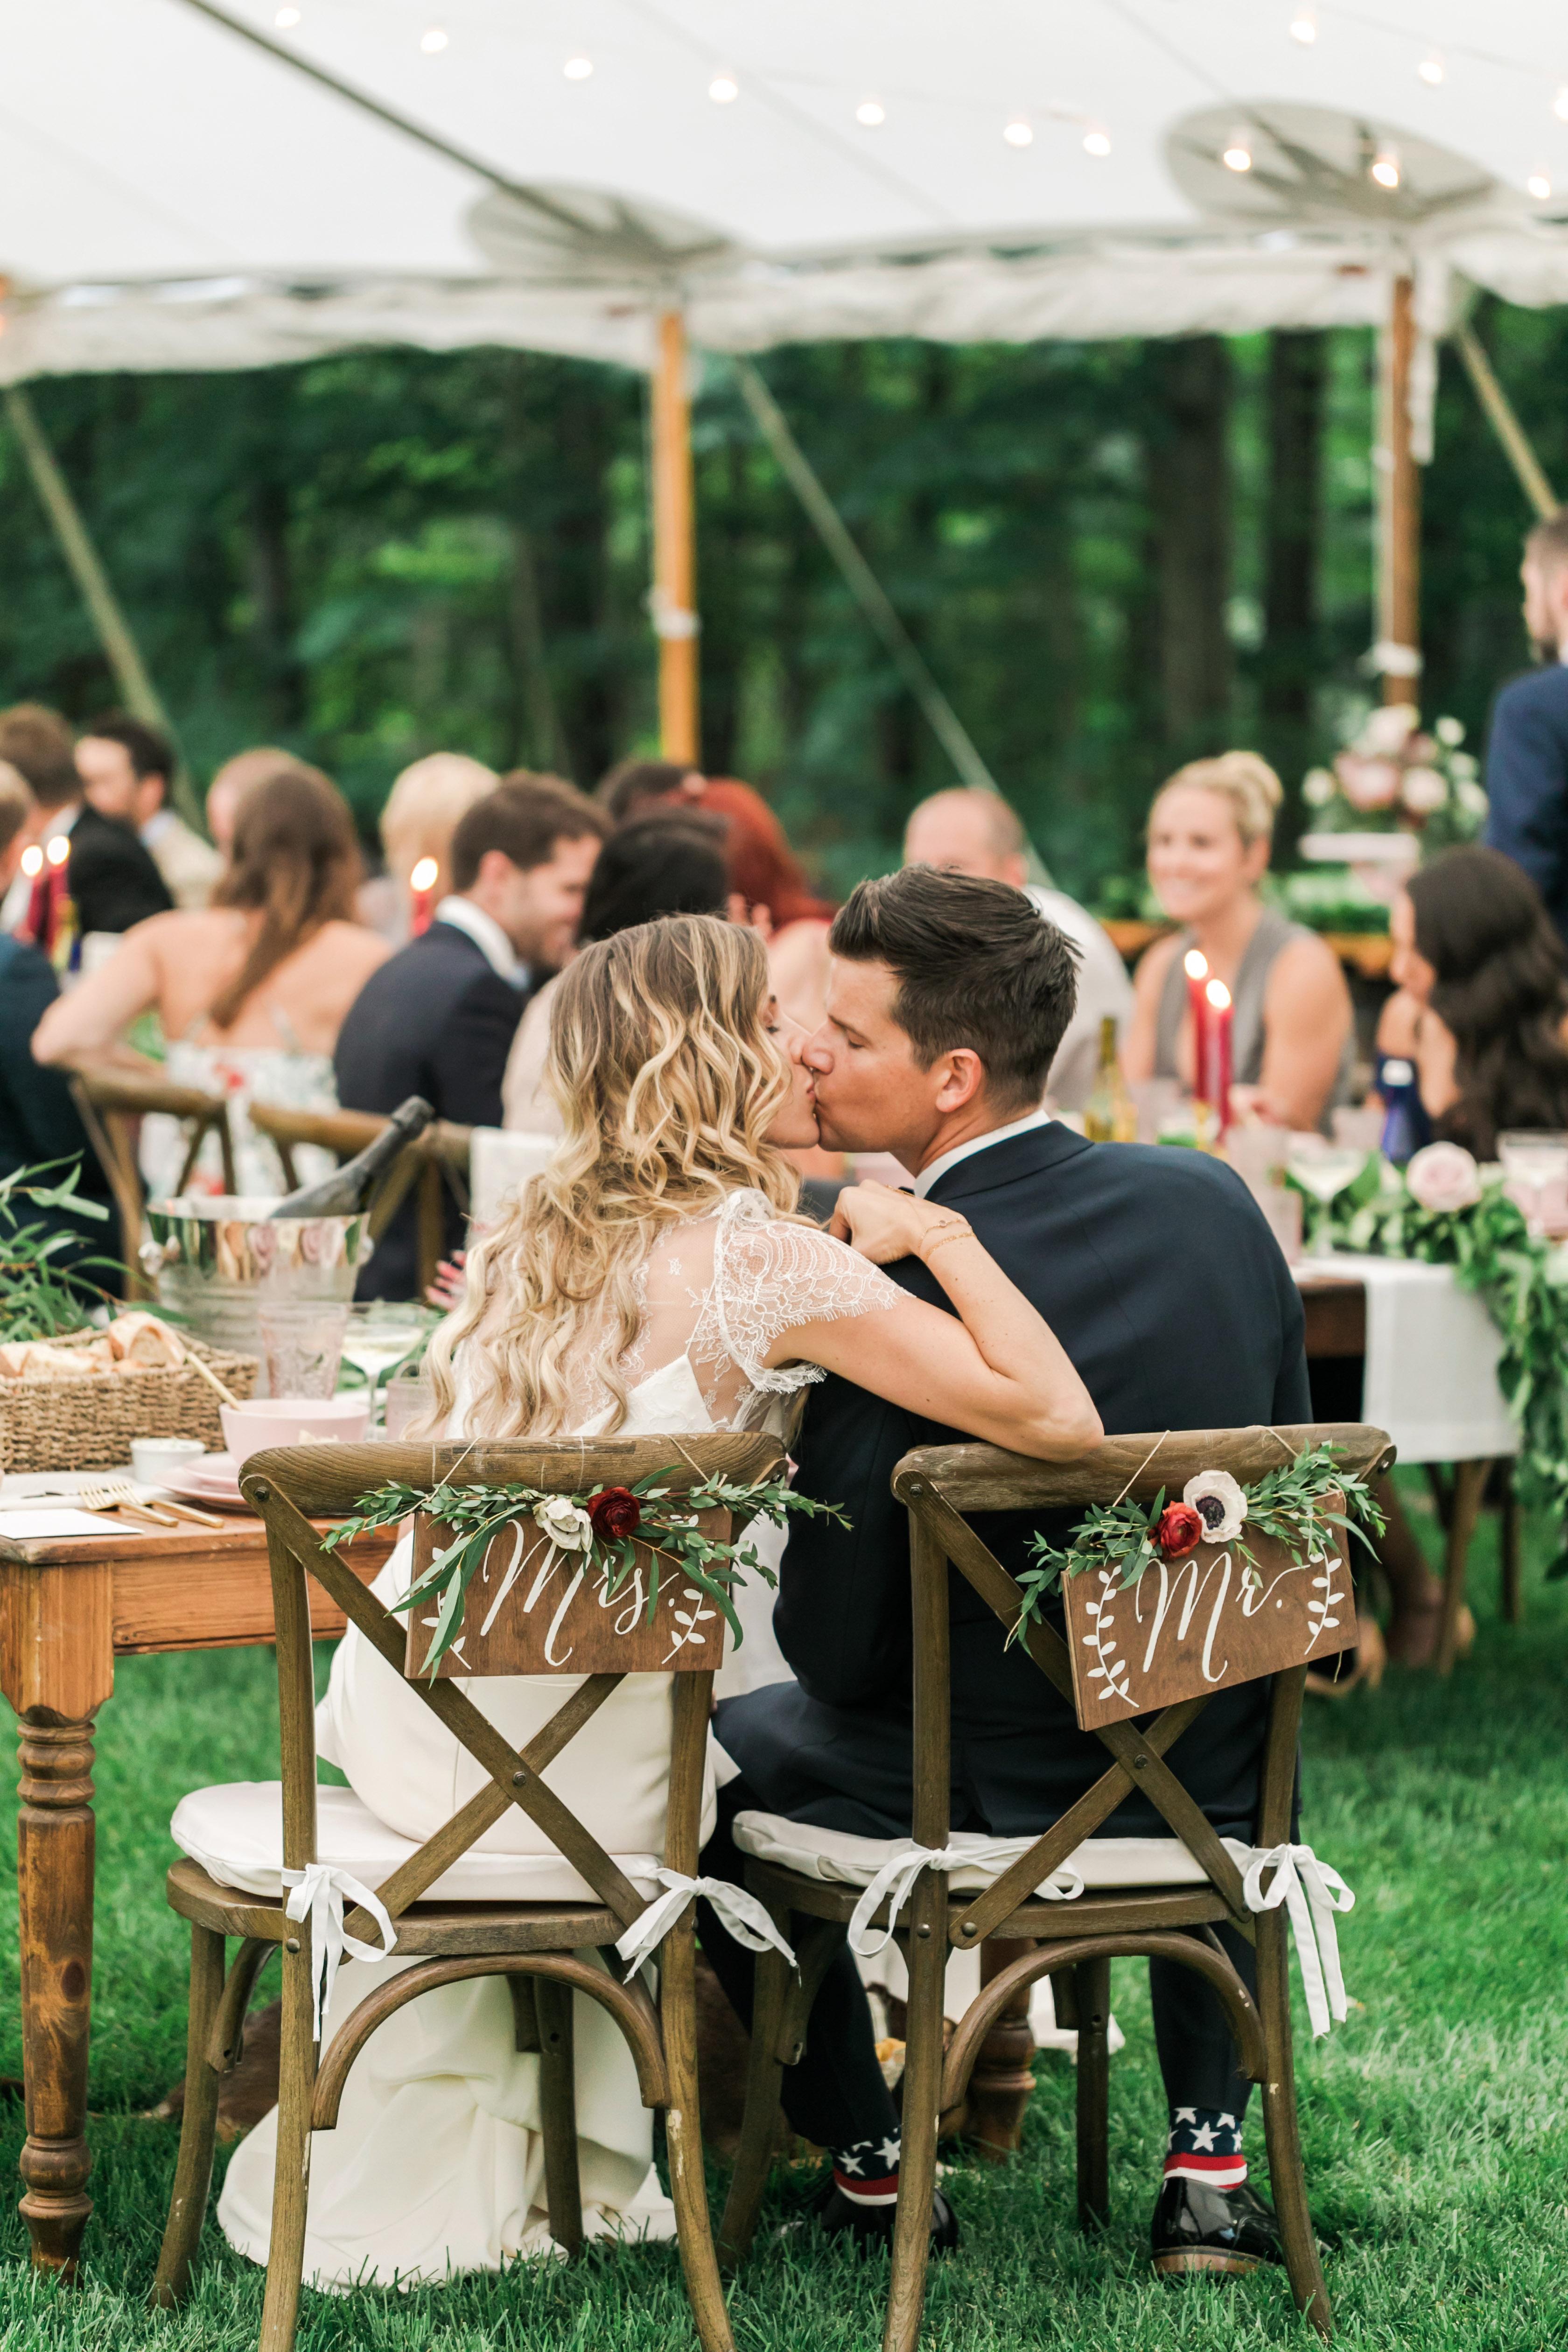 vanessa steven wedding couple kiss chairbacks